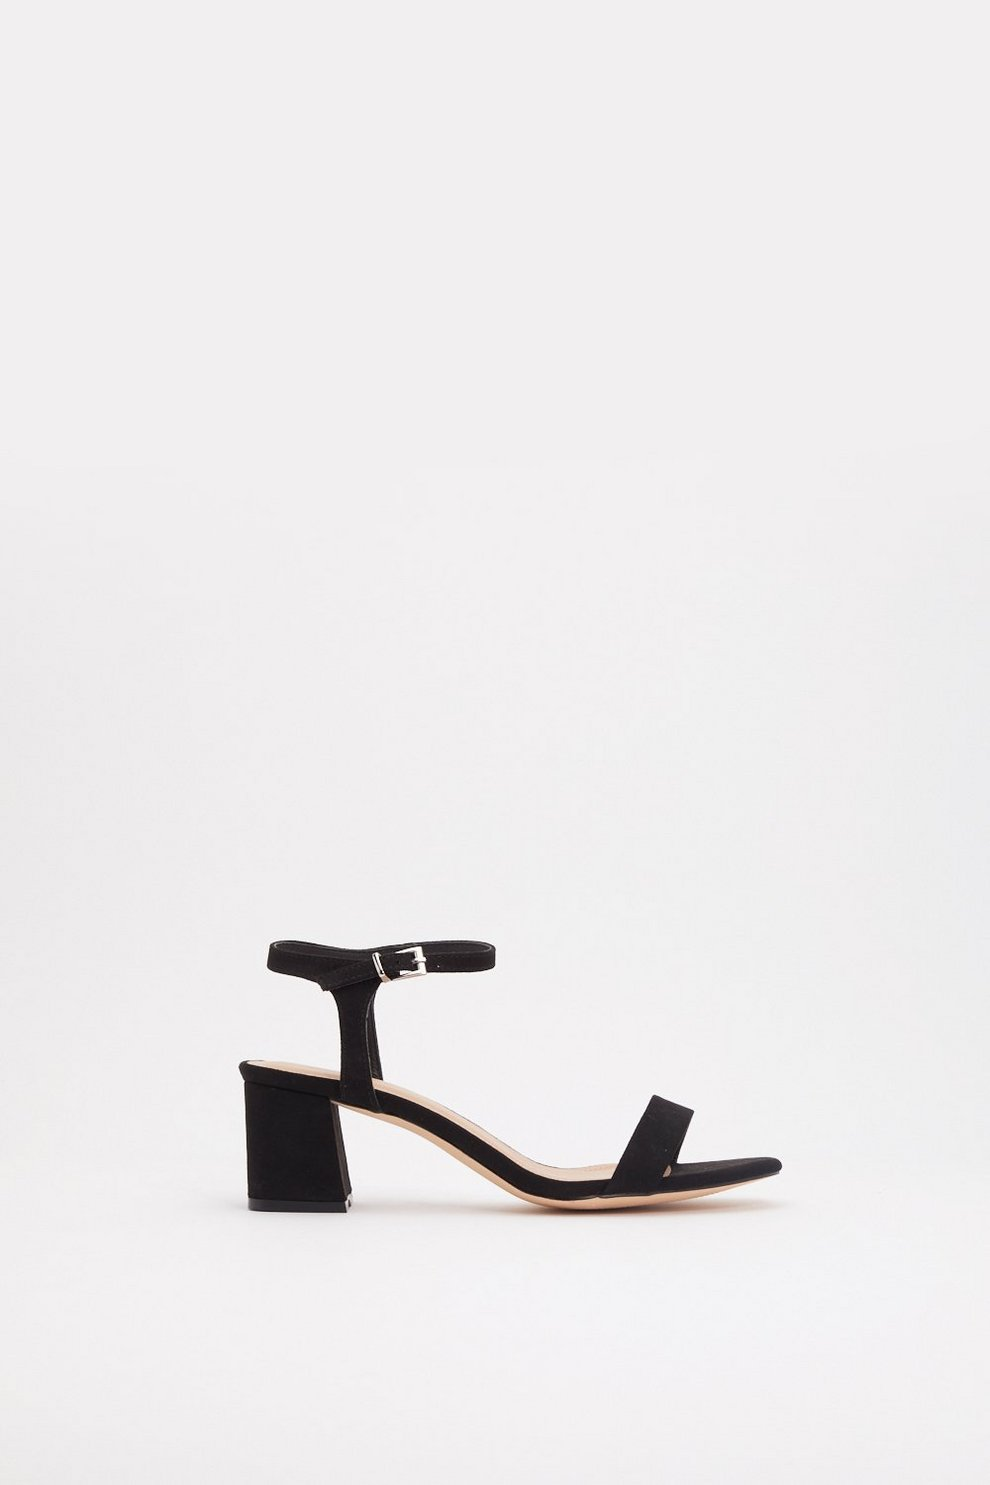 e5e194c5ae78 A Low It Flare Block Heel Sandals